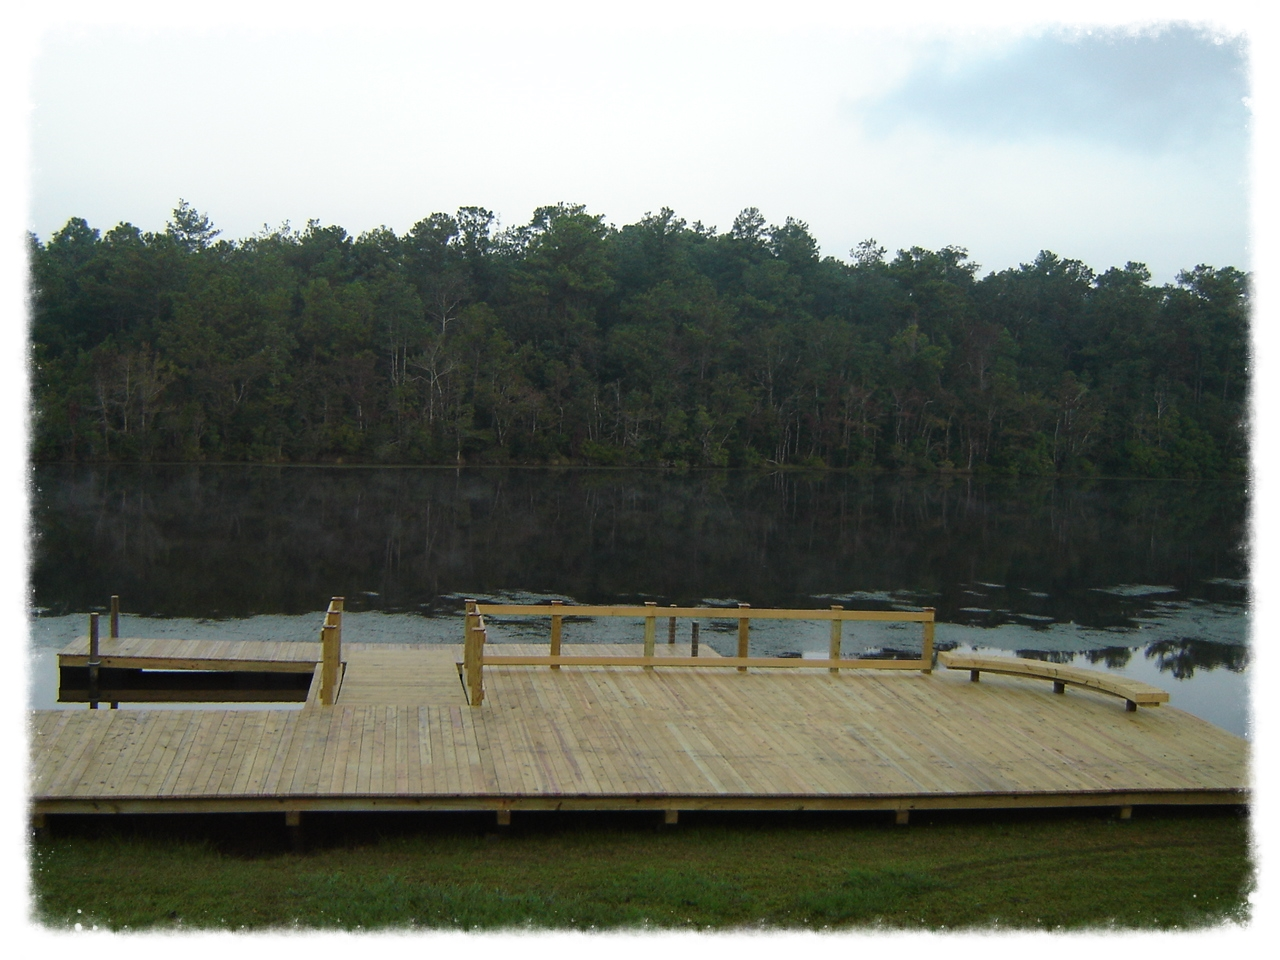 Boardwalk and Boat Launch